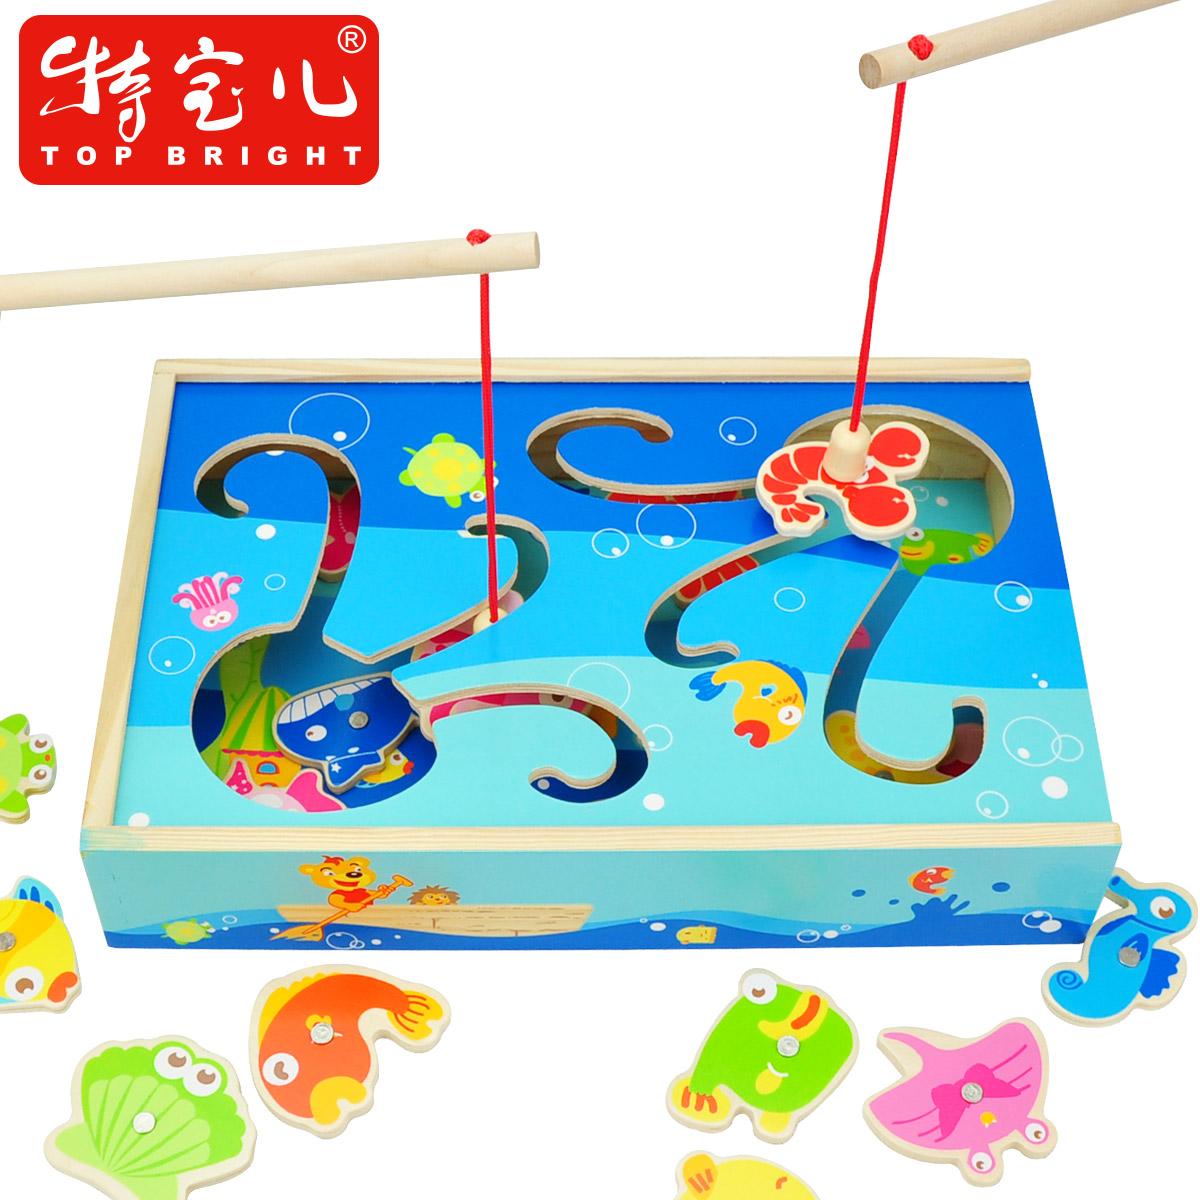 Boa chute double wooden magnetic fishing child toy baby toy yakuchinone 2 fishing toy(China (Mainland))